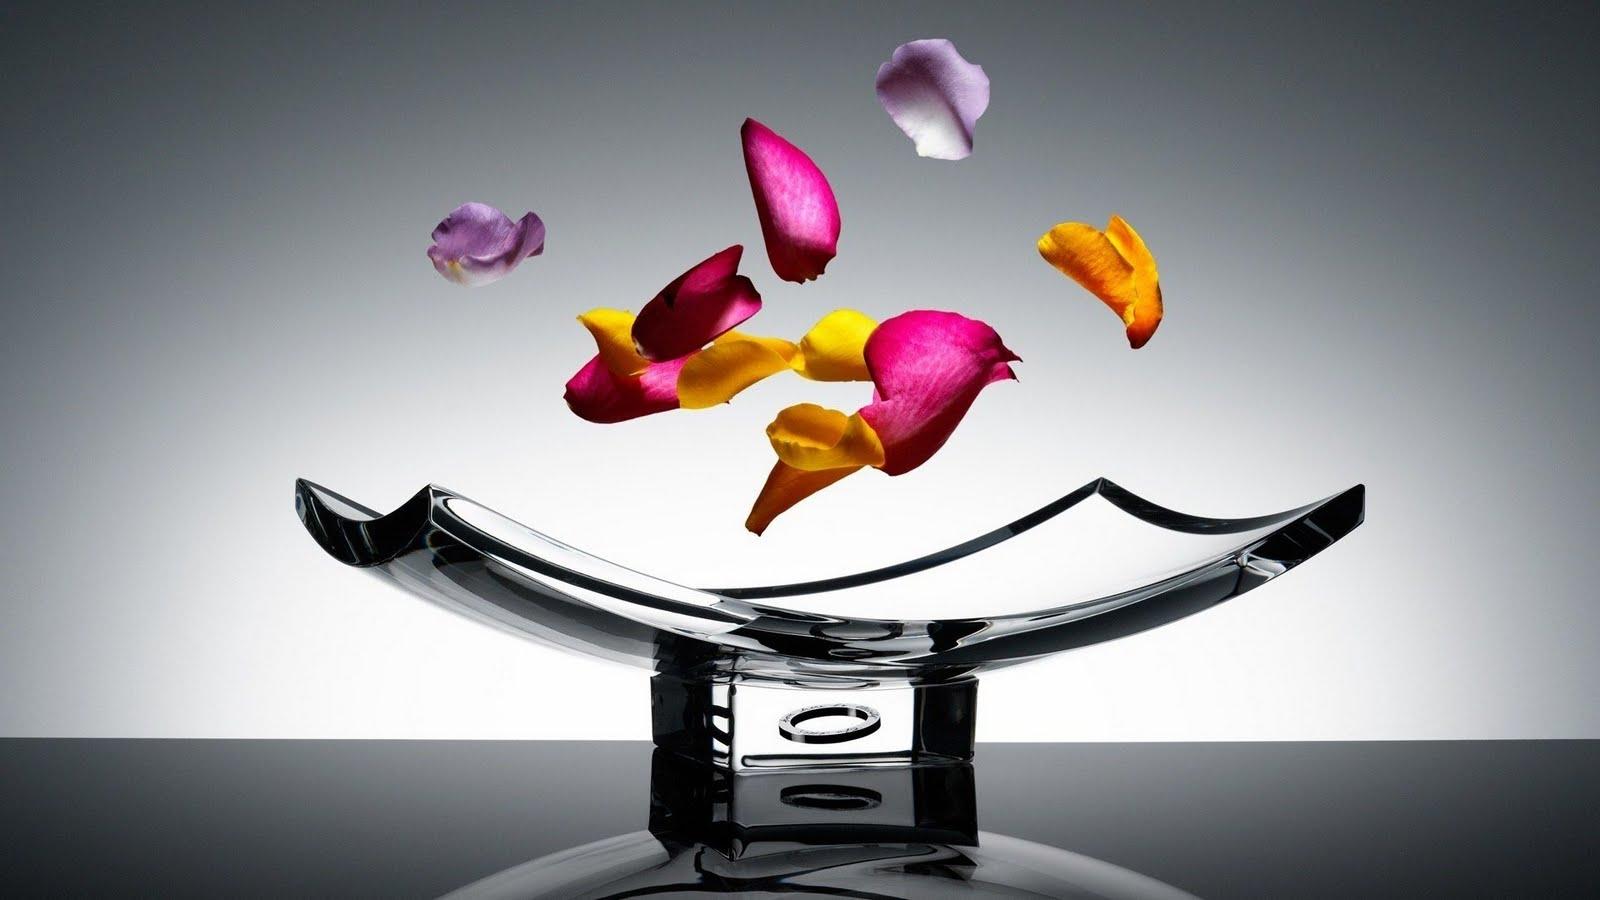 Glass 3d Hd Wallpapers 1080p: FREE !!! Hot Vista HD Wallpapers